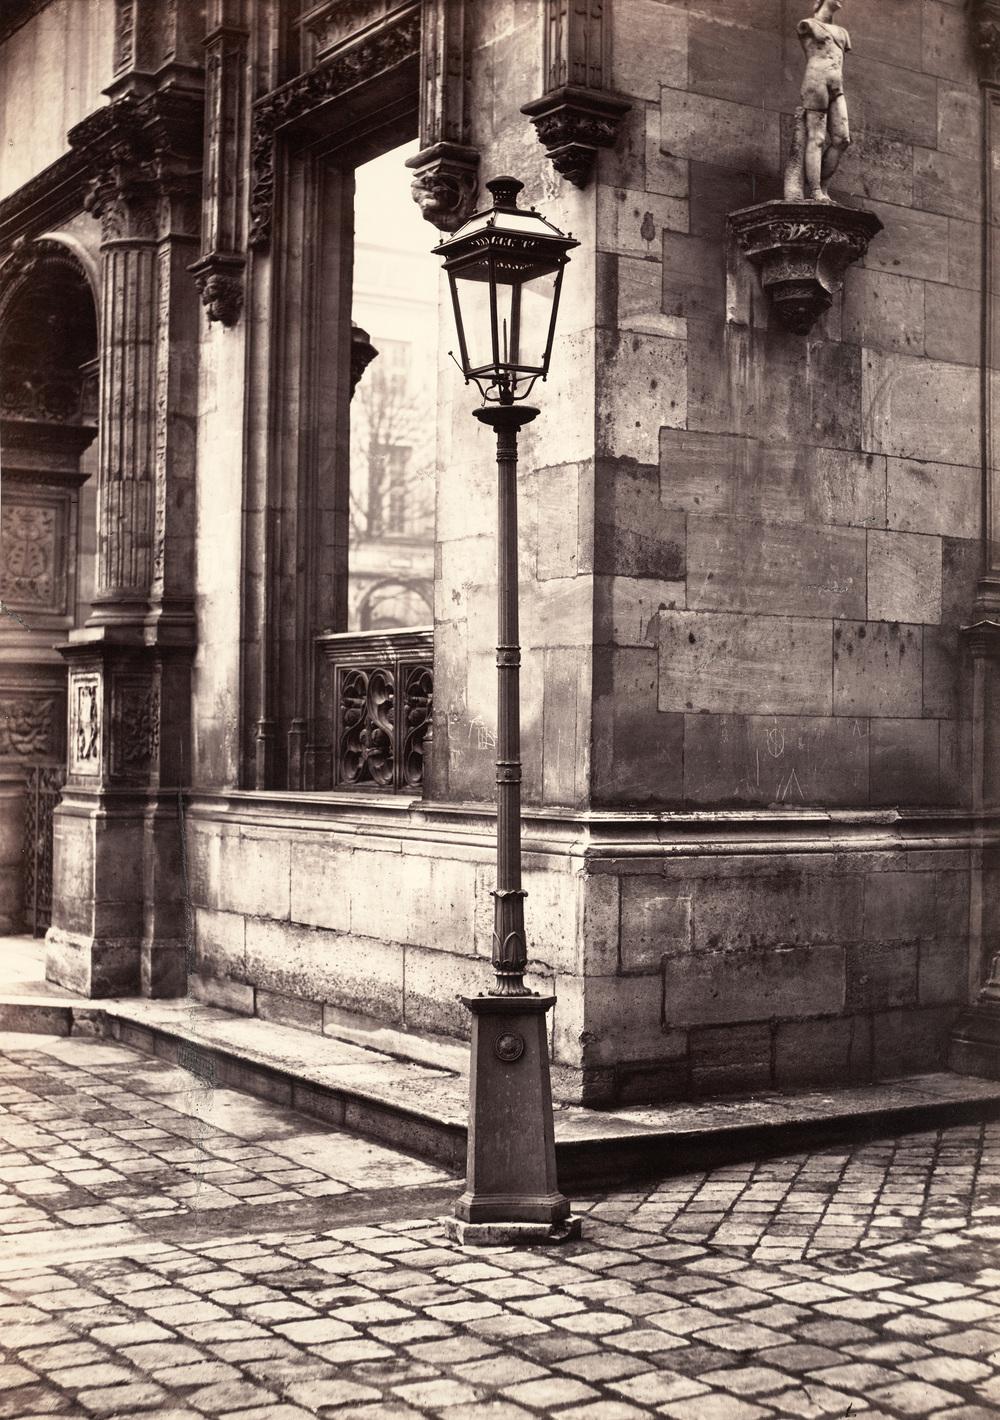 14-lamppost-entrance-to-the-c3a9cole-des-beaux-arts-ca-1870.jpg